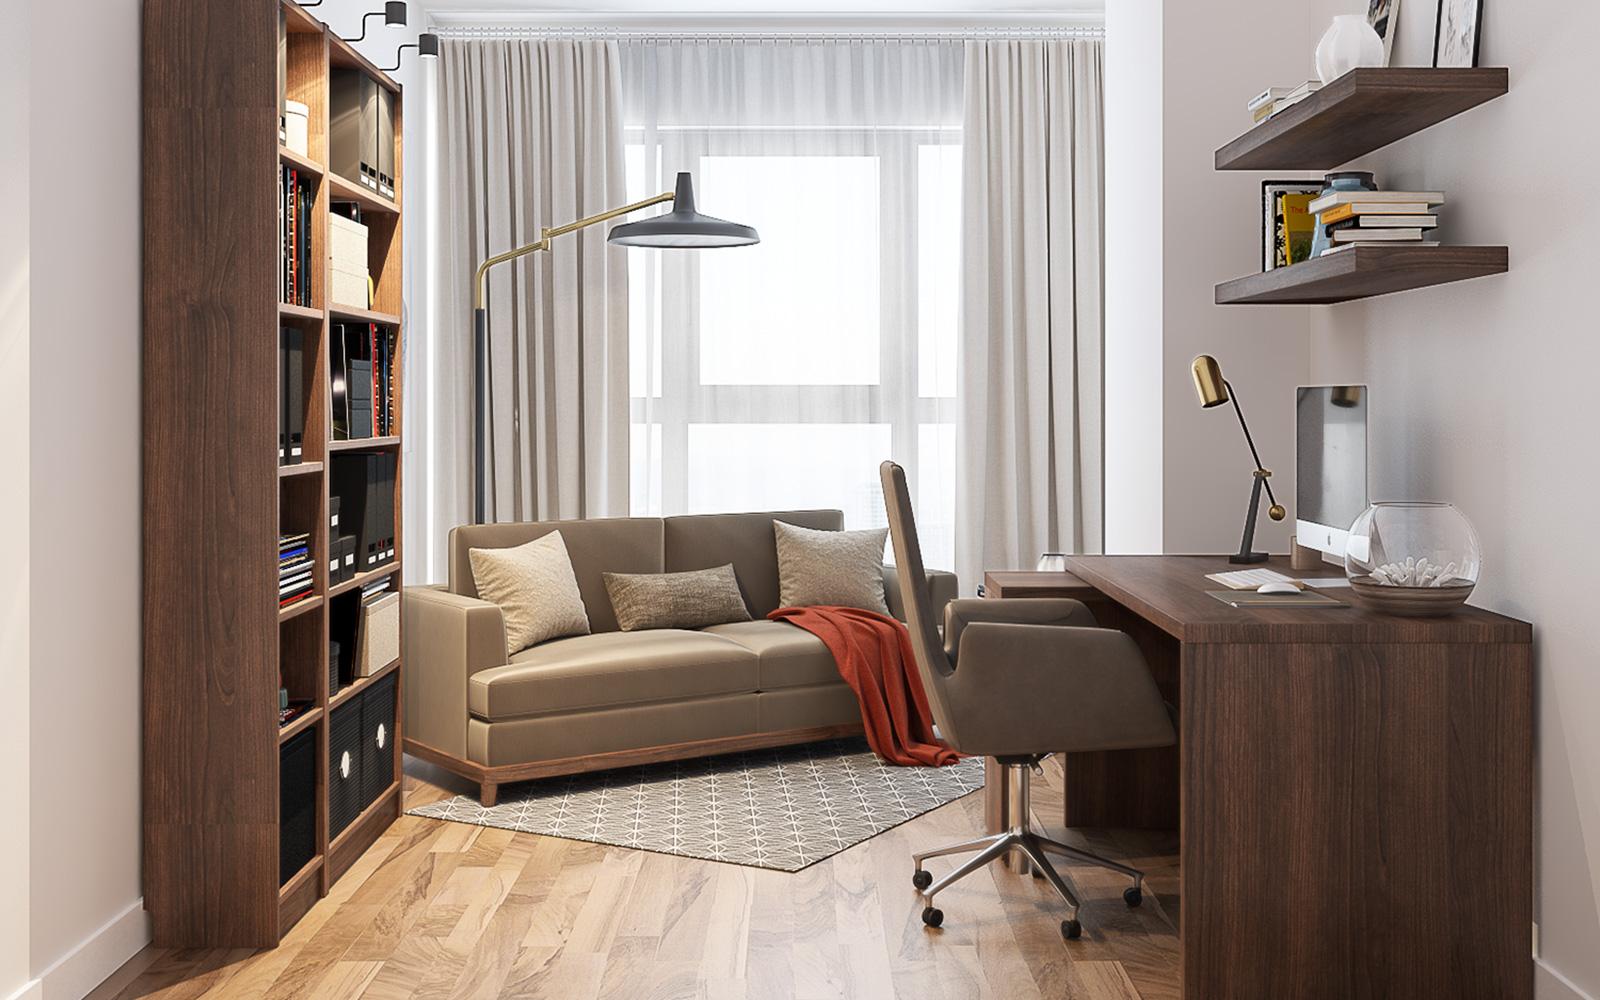 Vogue Design - Istanbul Gayrettepe Flat2